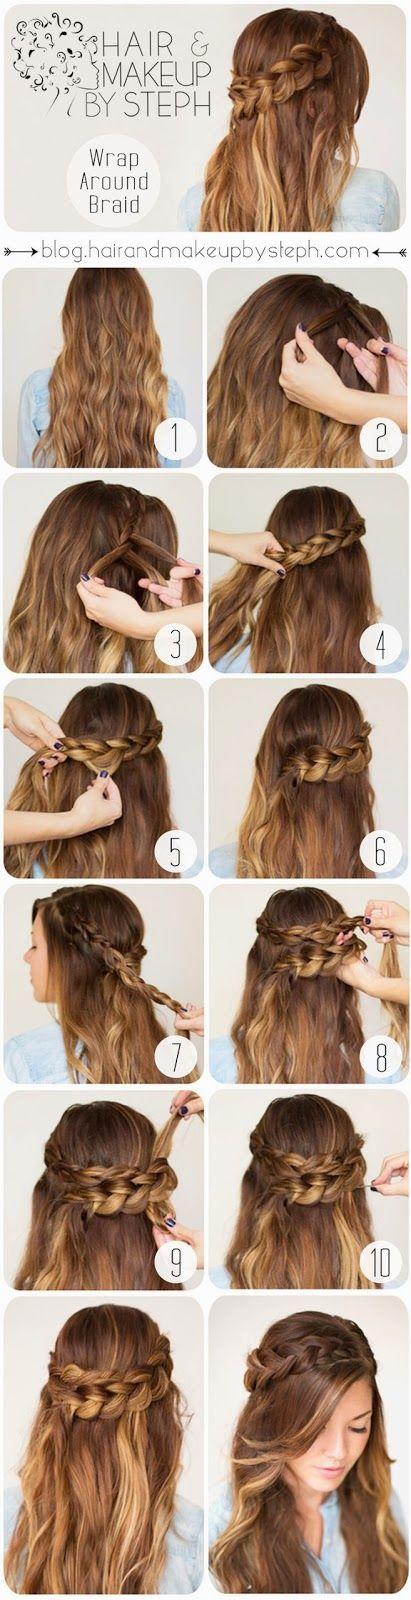 How To Do a Wrap Around Braid #hairstyle #hair #braid #beuaty #style #fashion #longhair